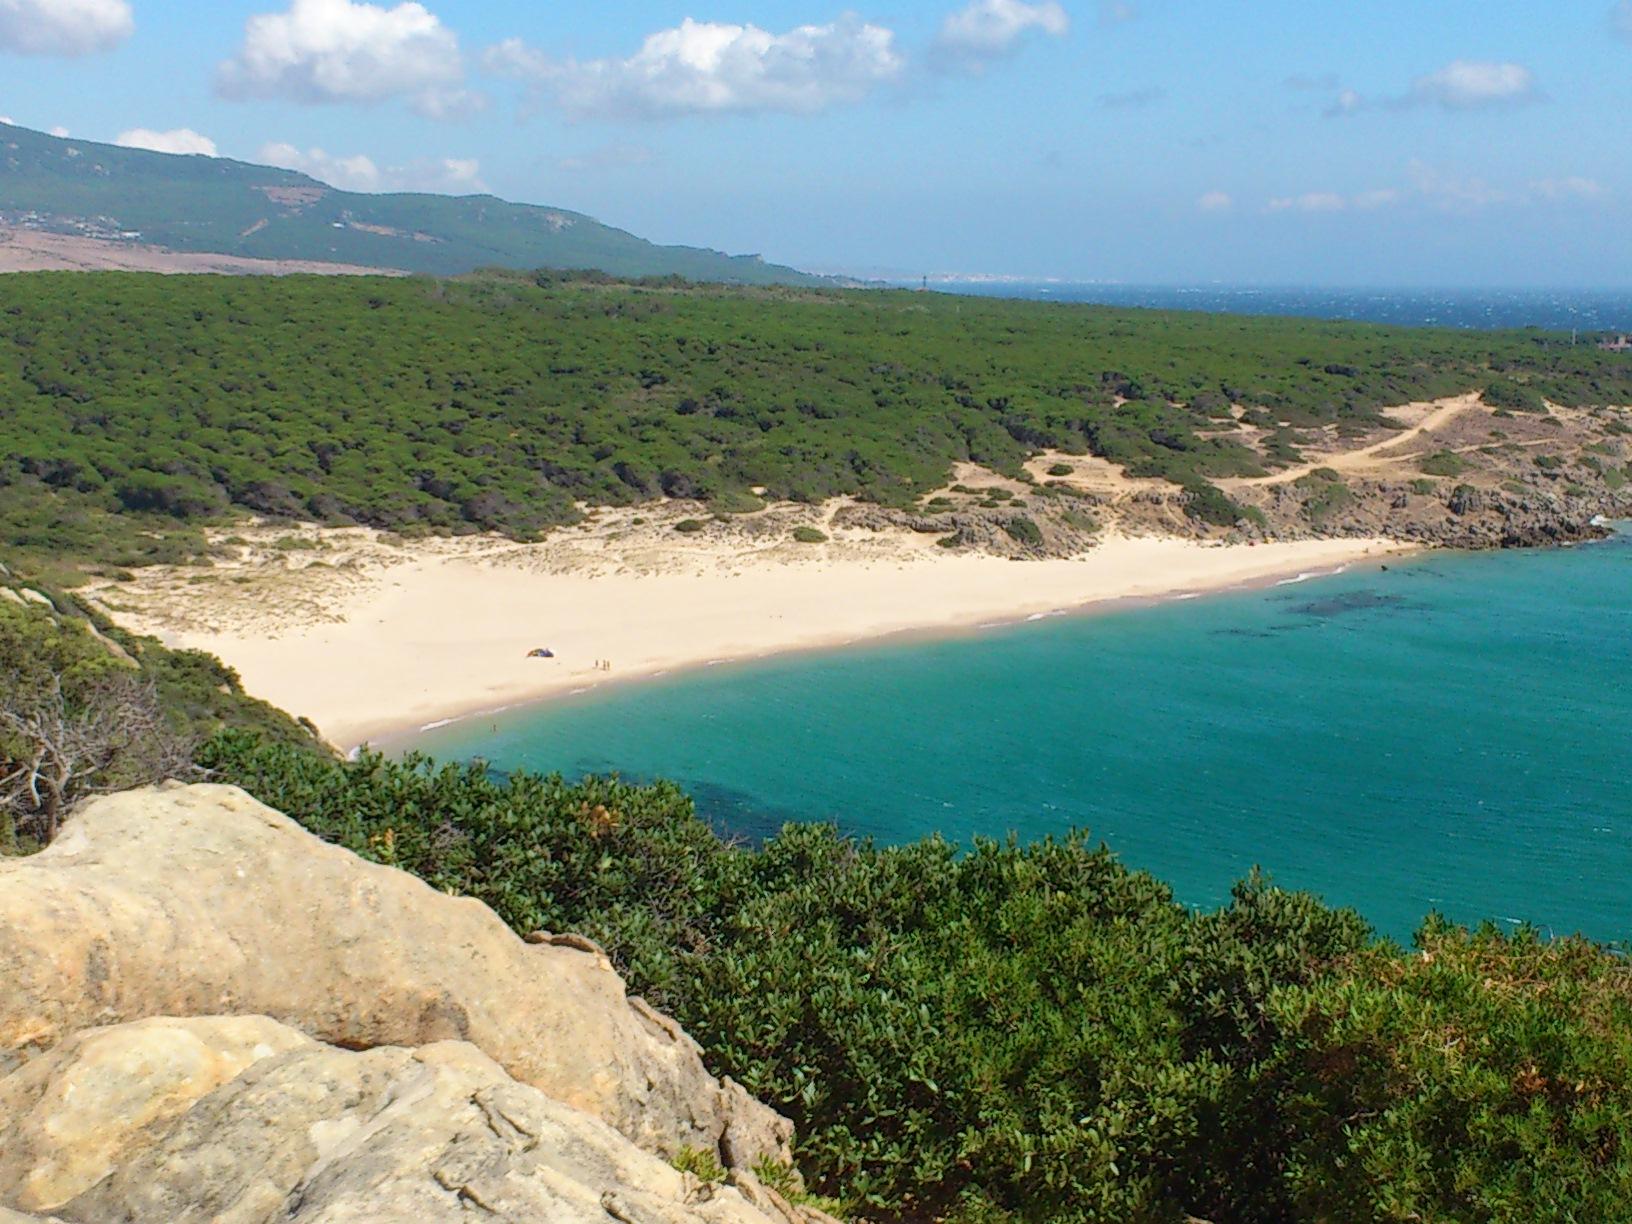 Another deserted beach awaits… Playa Arroyo del Canuelo near the village of Zahara de los Atunes...